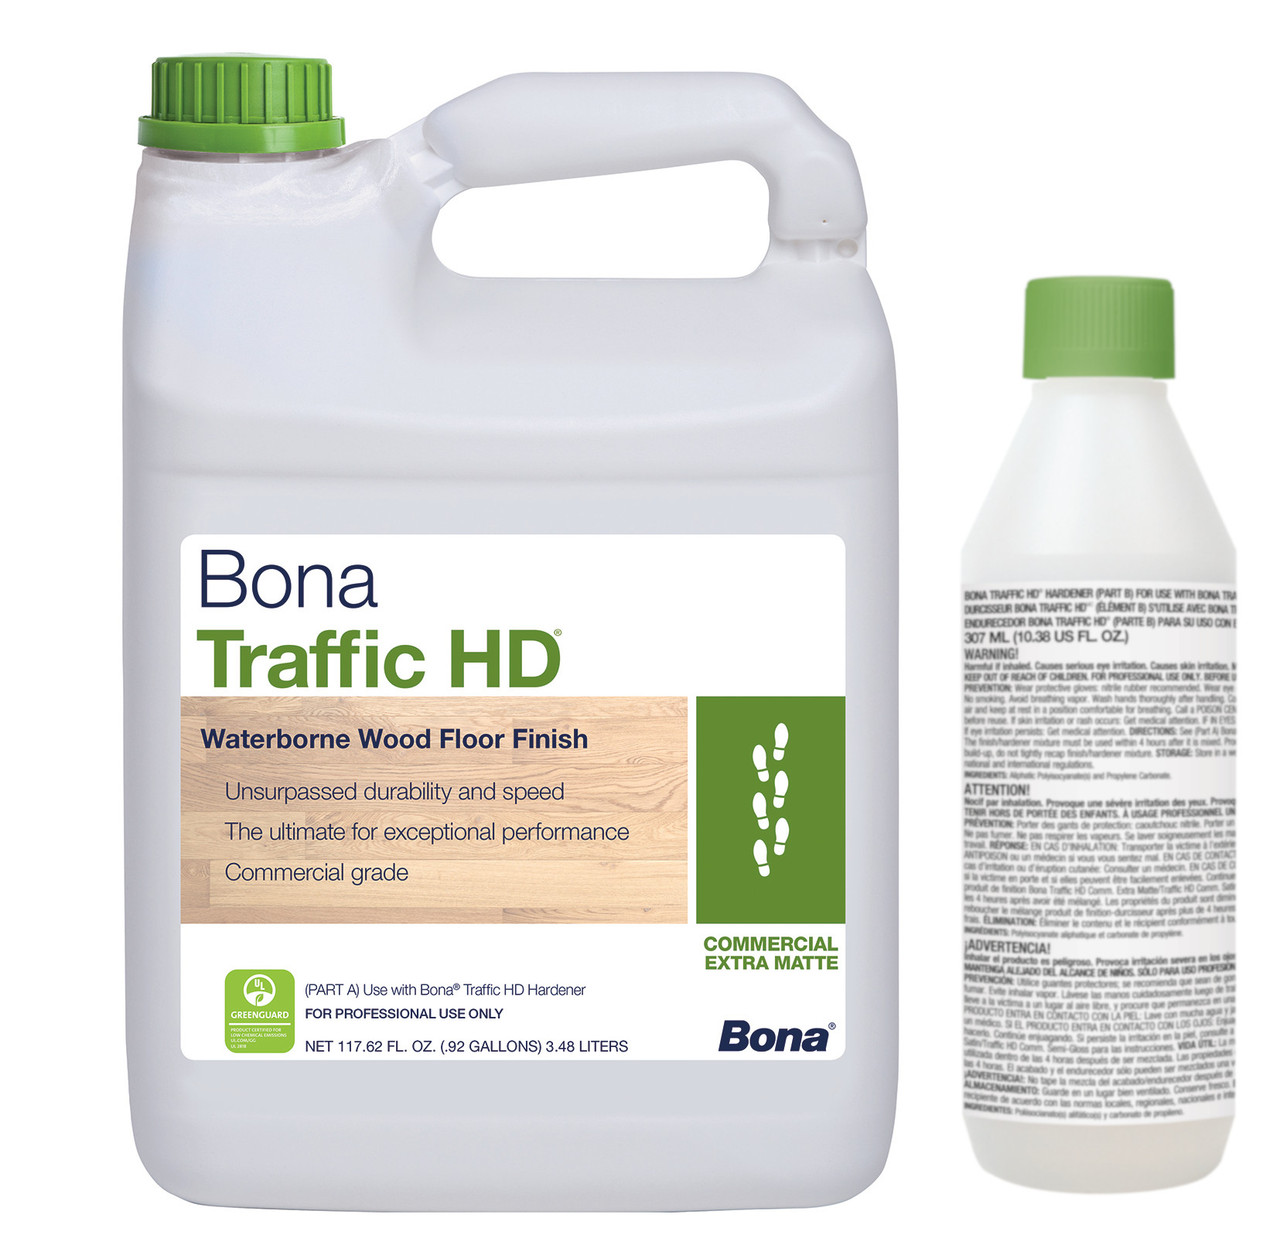 Bona Traffic HD Commercial Gallon